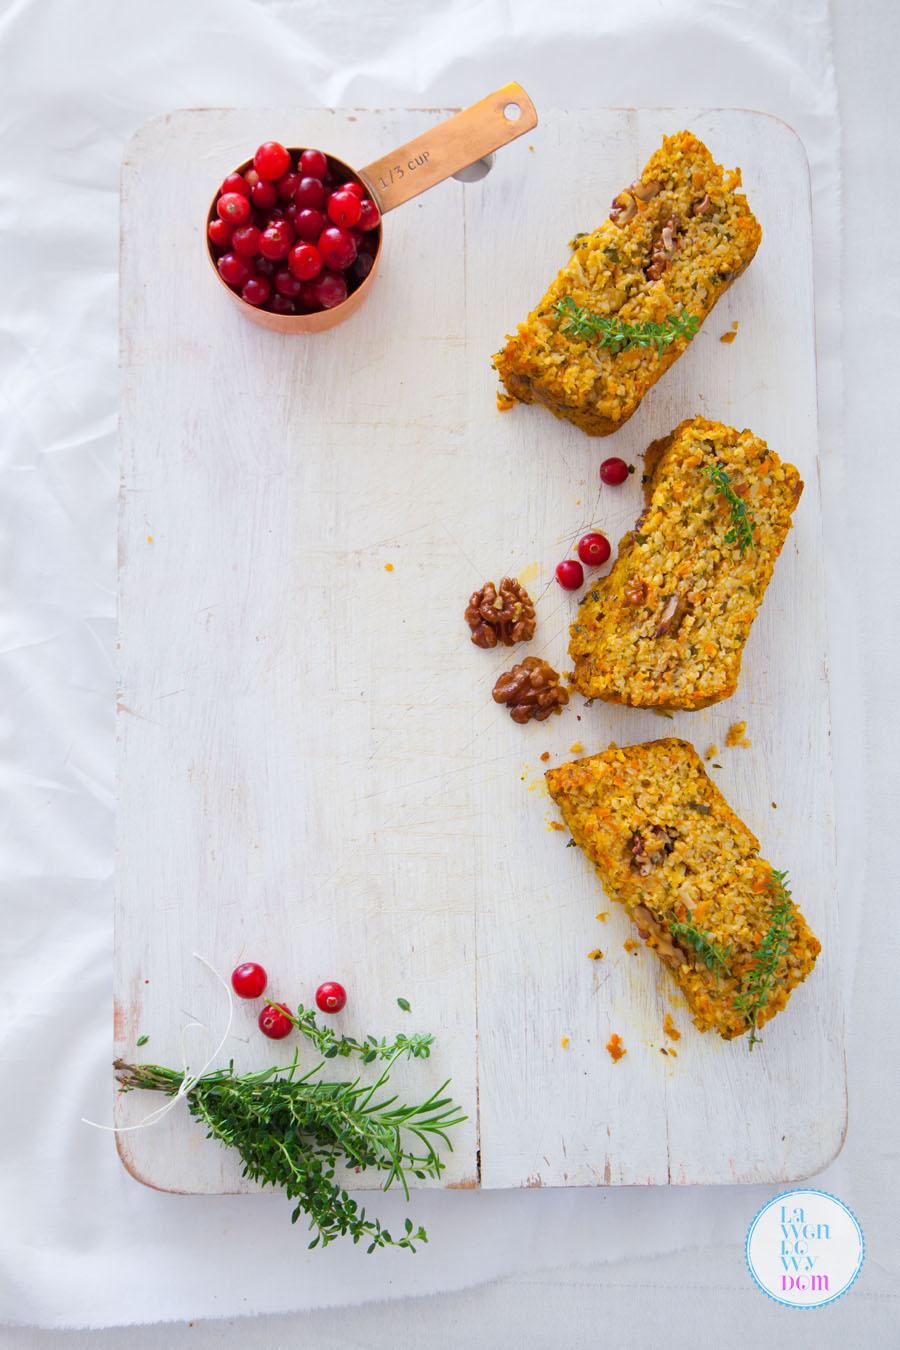 wegetarianski-pasztet-jaglany-y-warzywami_03